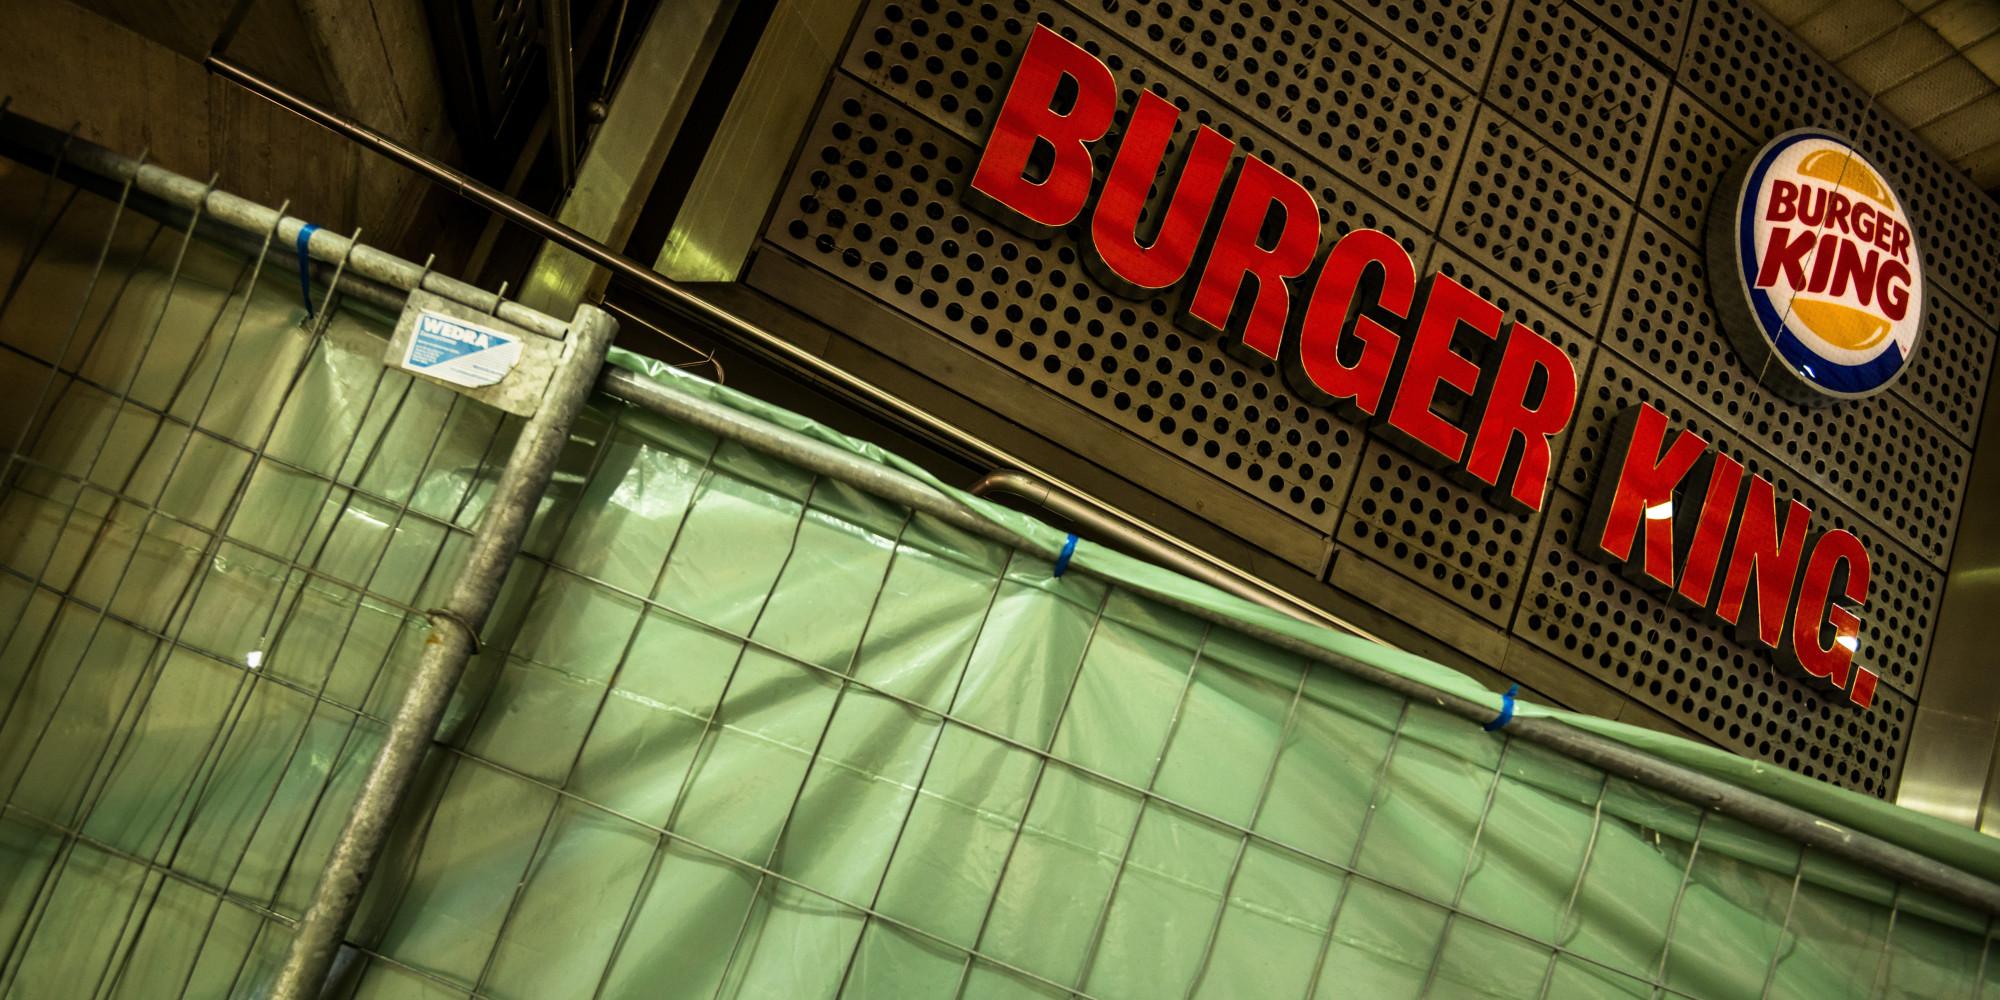 burger king yi ko droht die pleite und 3000. Black Bedroom Furniture Sets. Home Design Ideas